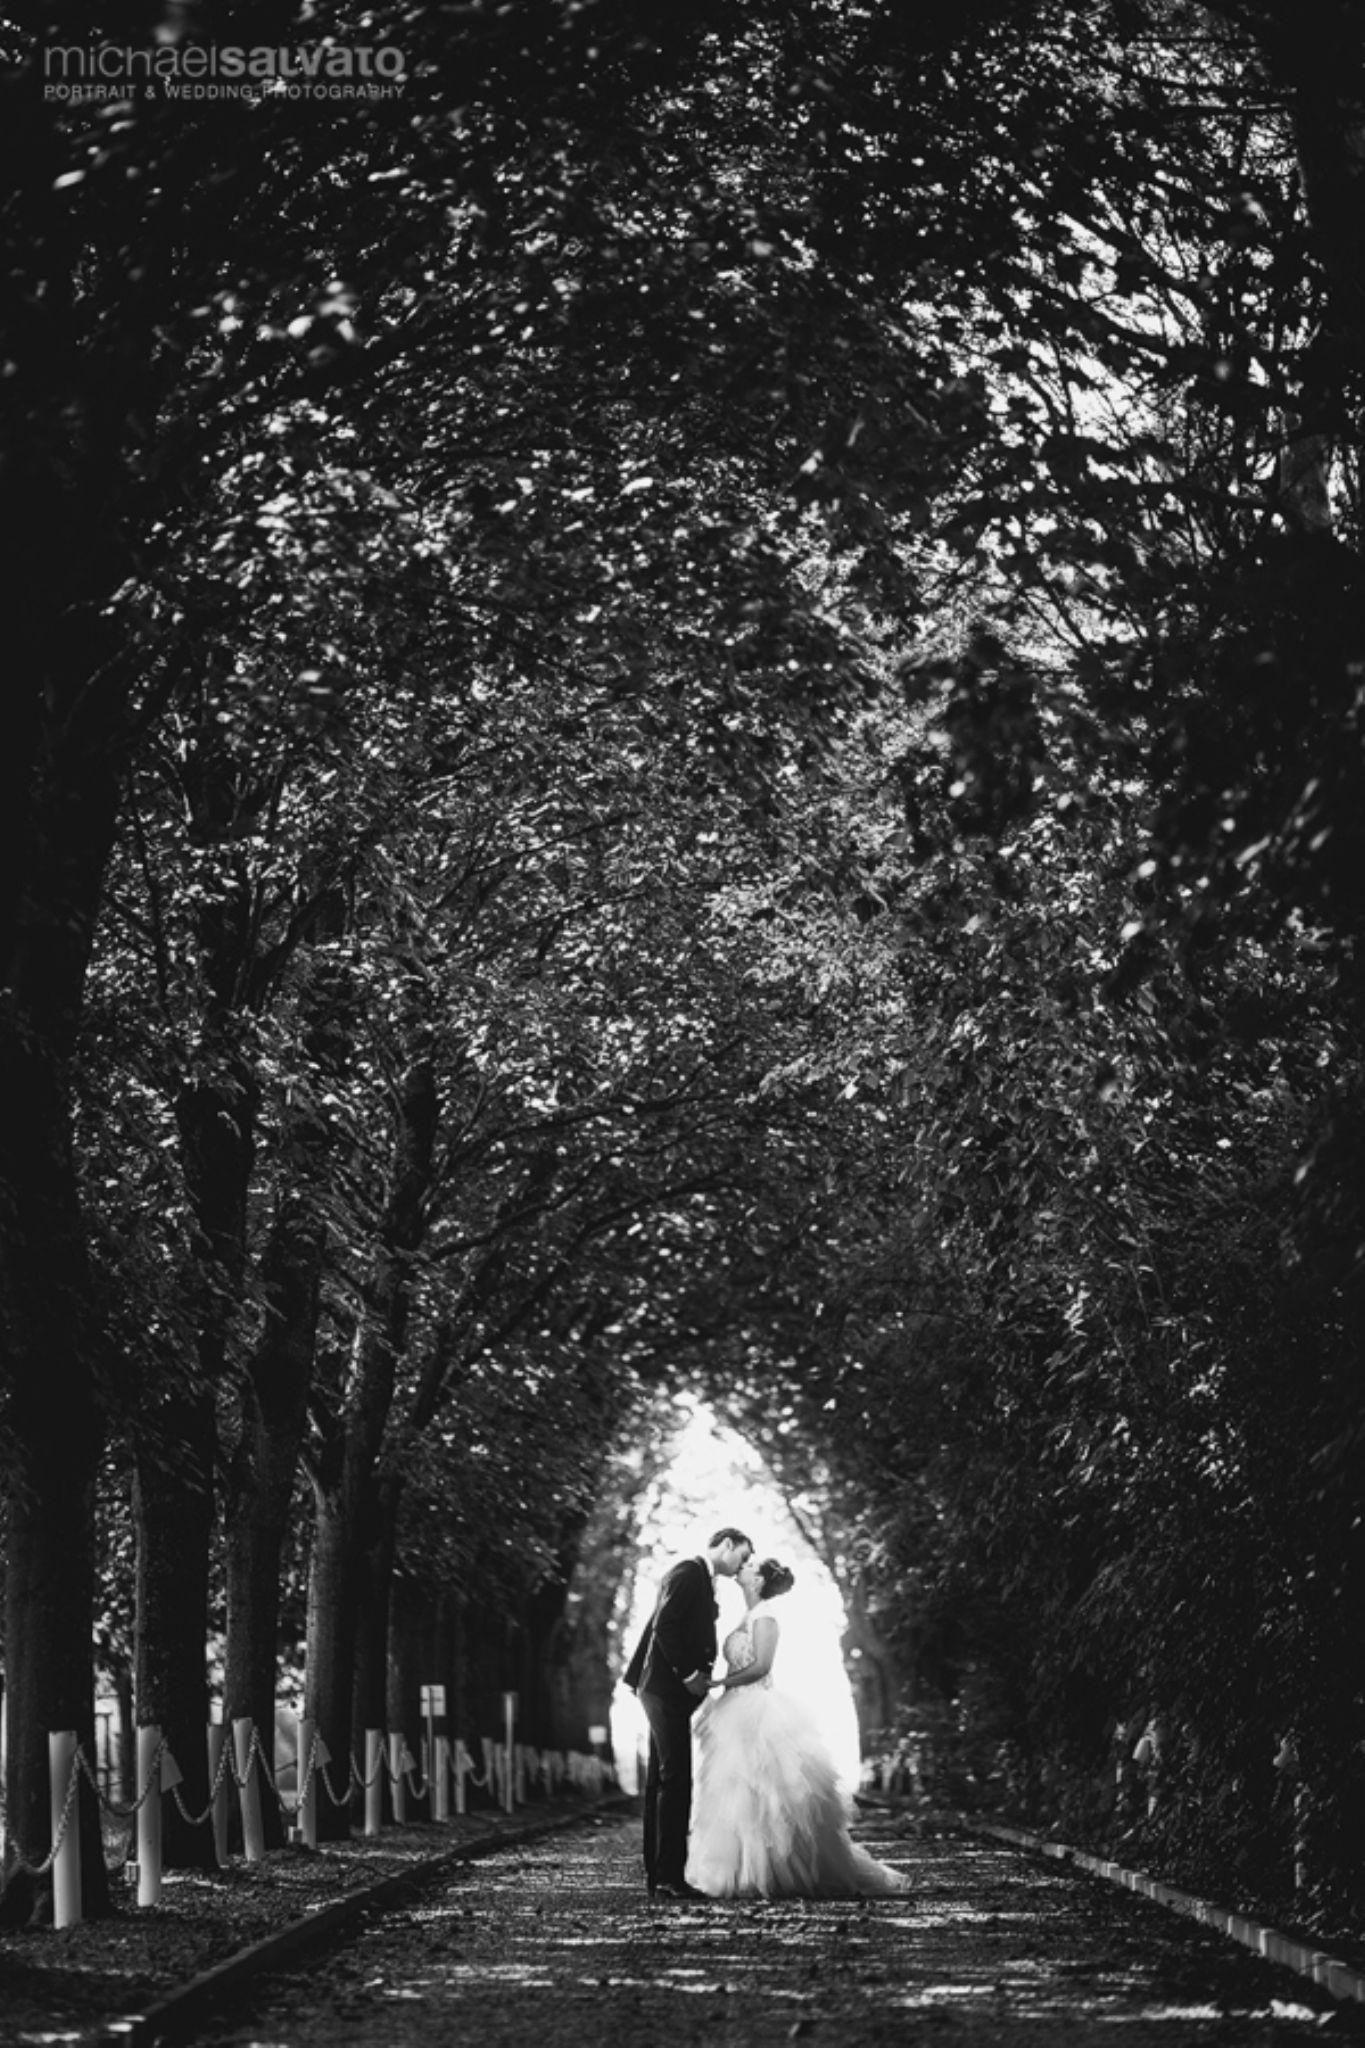 Wedding 2014 by Michael Salvato